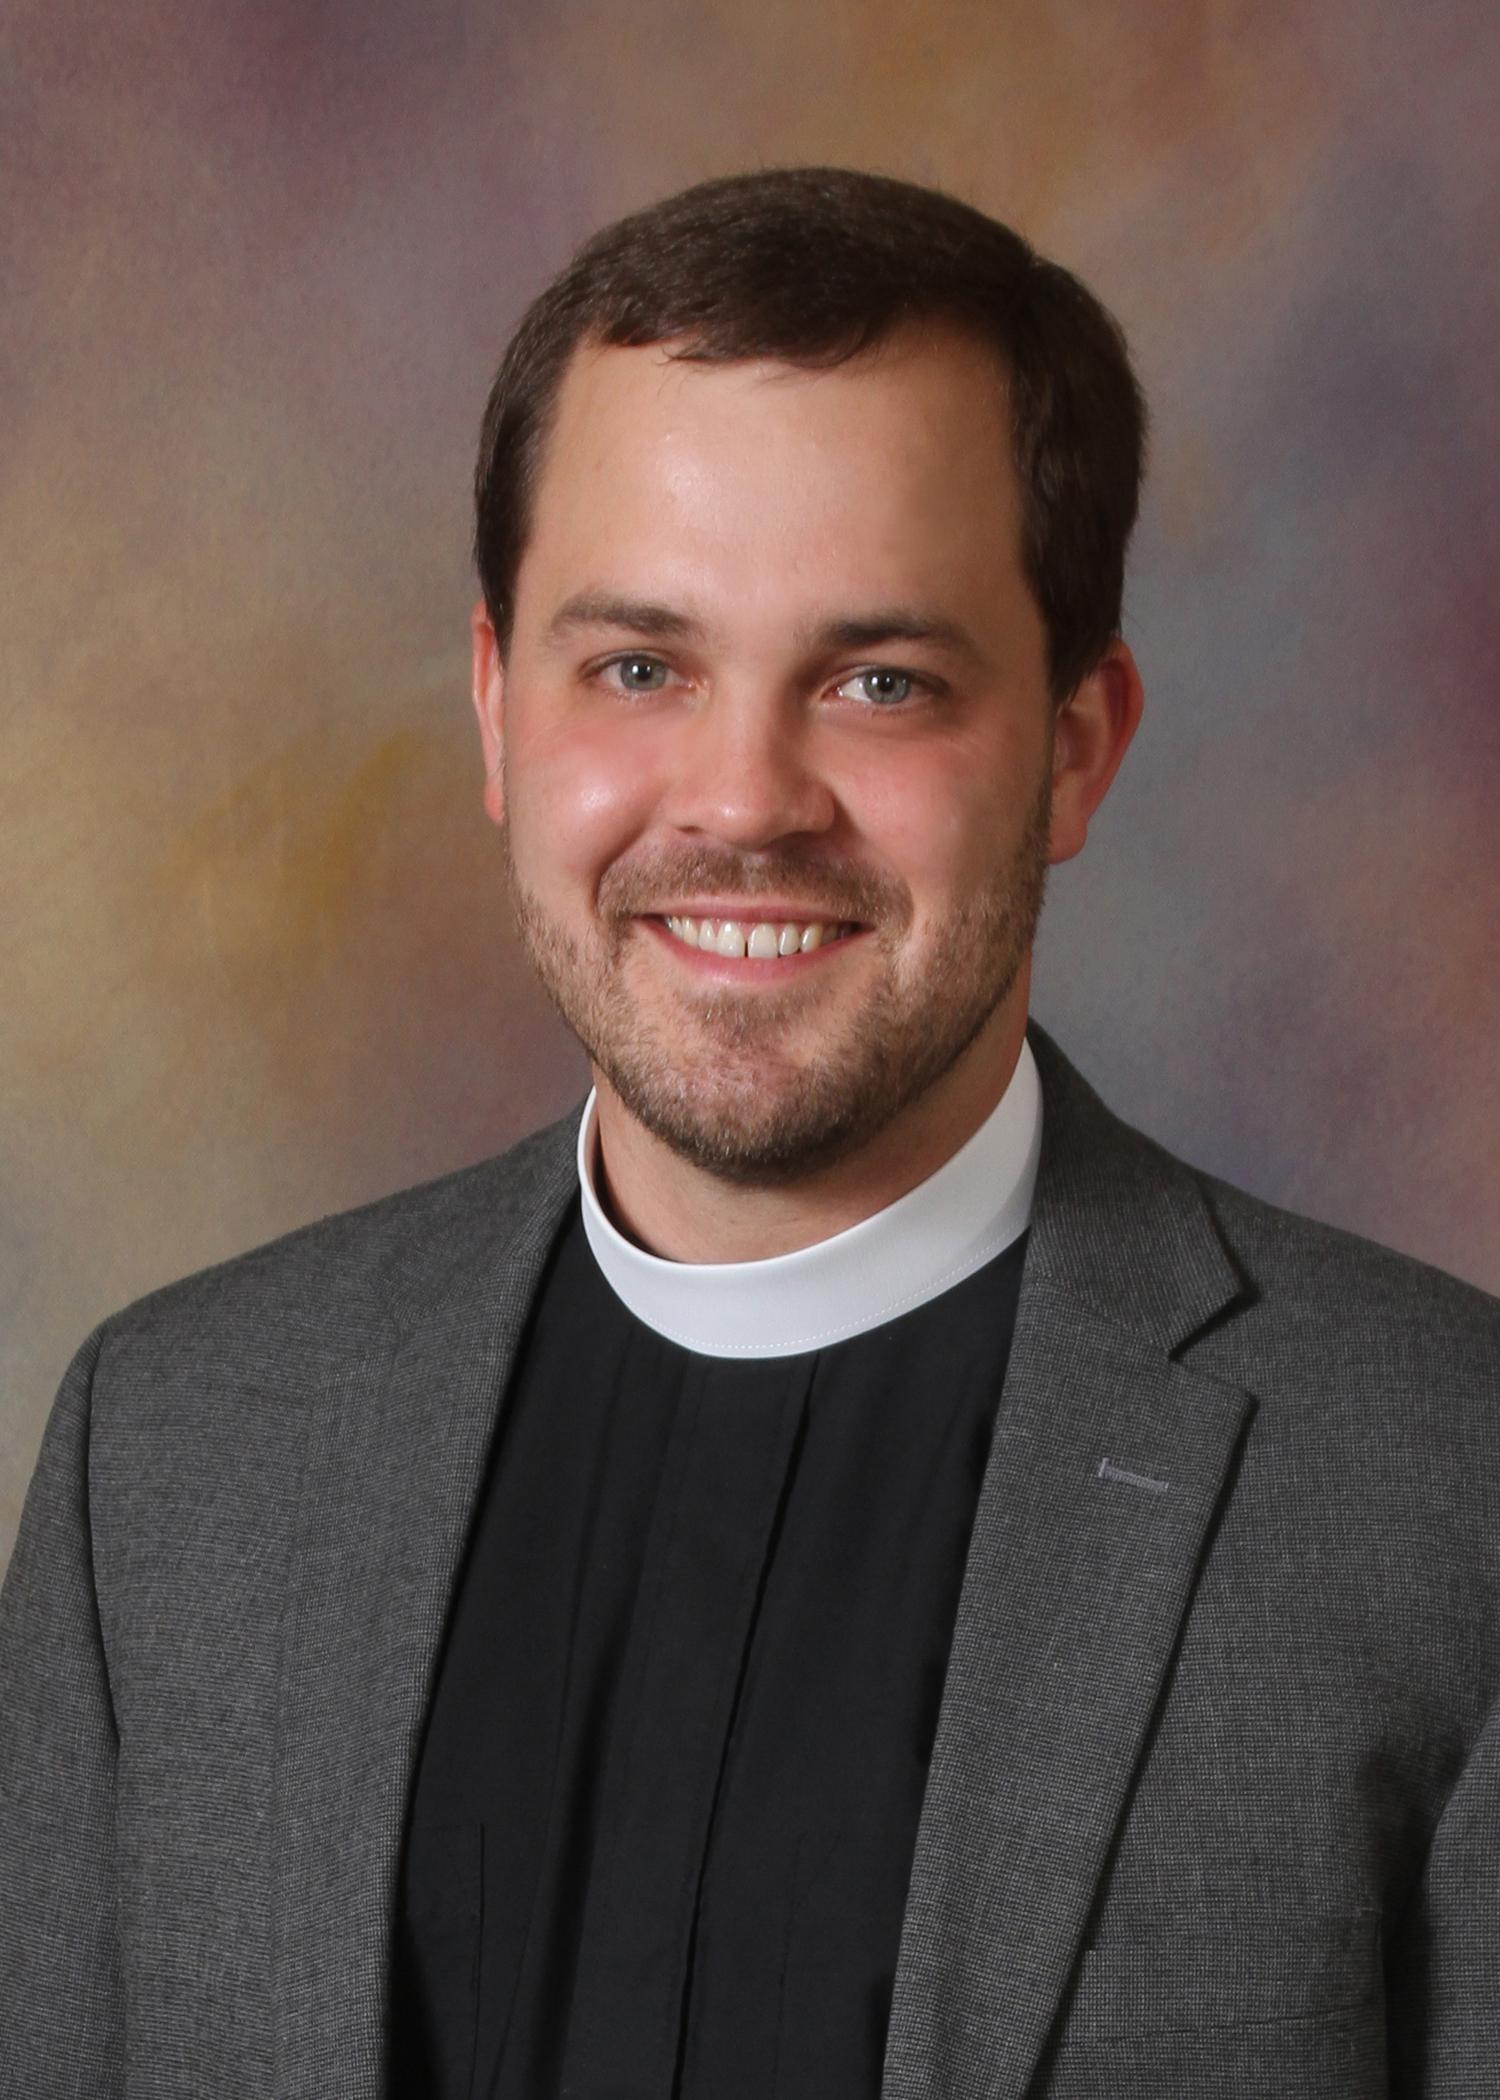 The Rev. Peter Gray